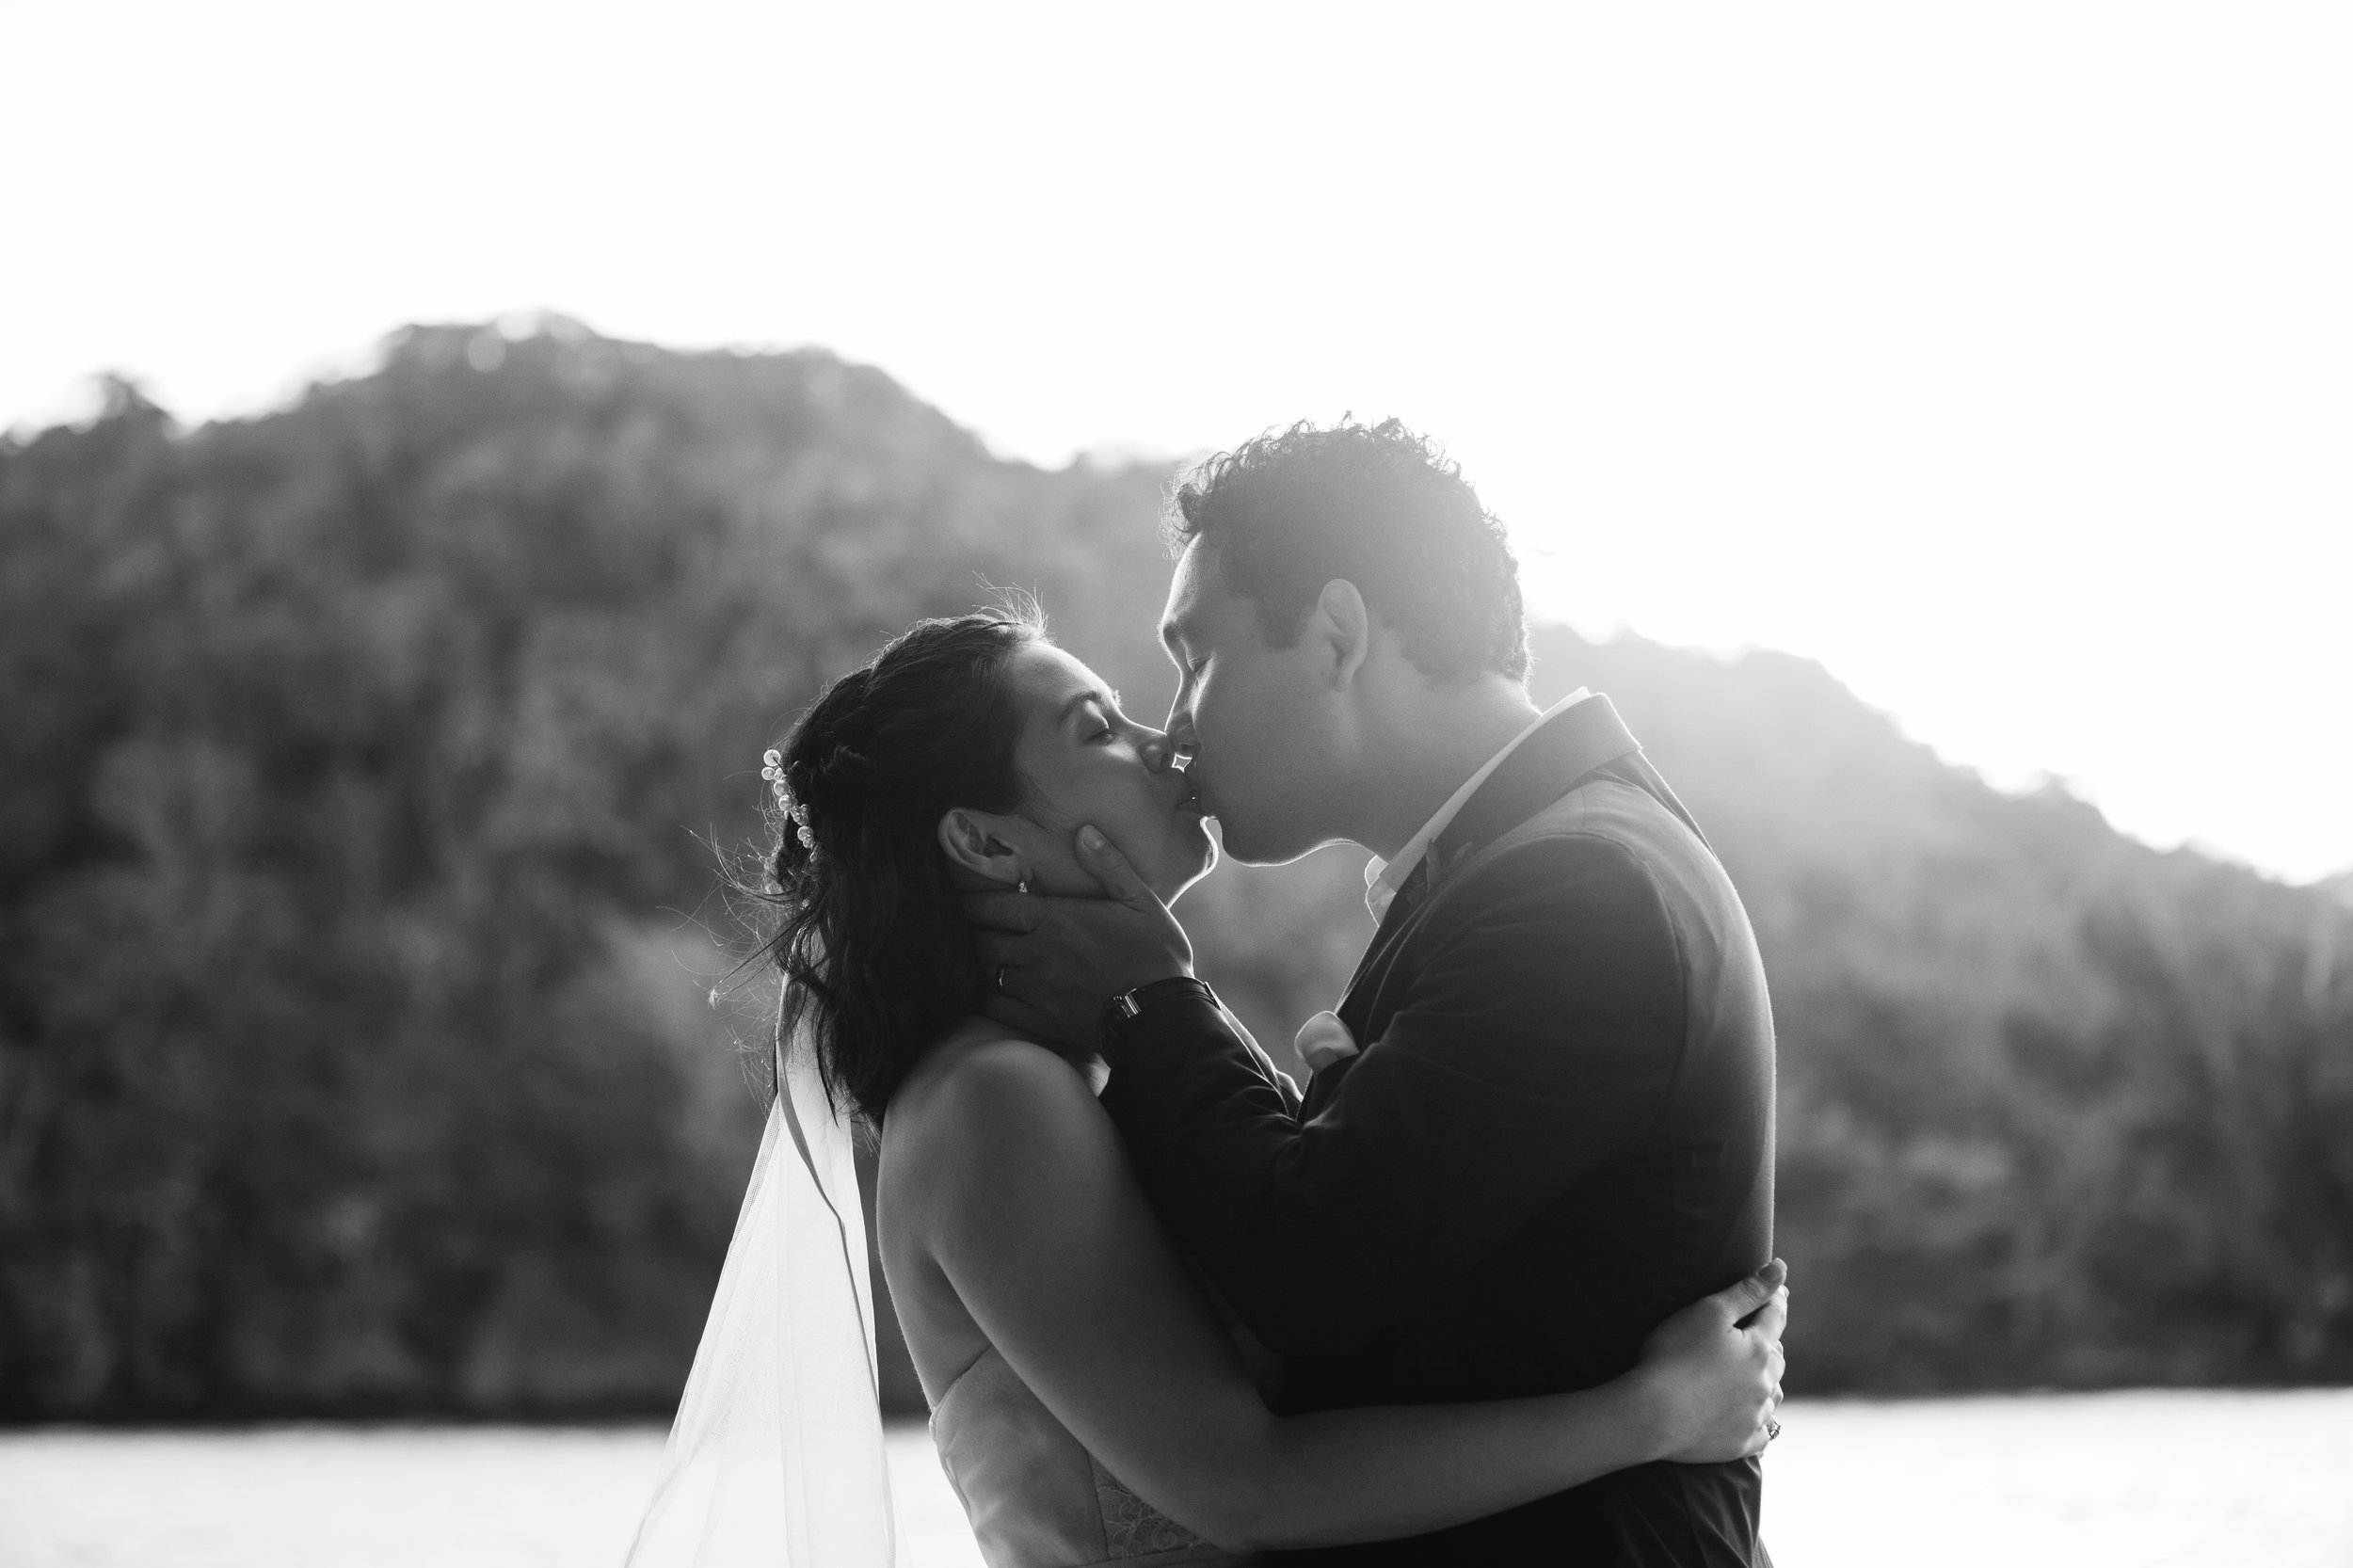 Fiji Wedding Ceremony - Fiji Beach Wedding Elopement - The Remote Resort Fiji Islands - Hidden Beach Wedding Photographs